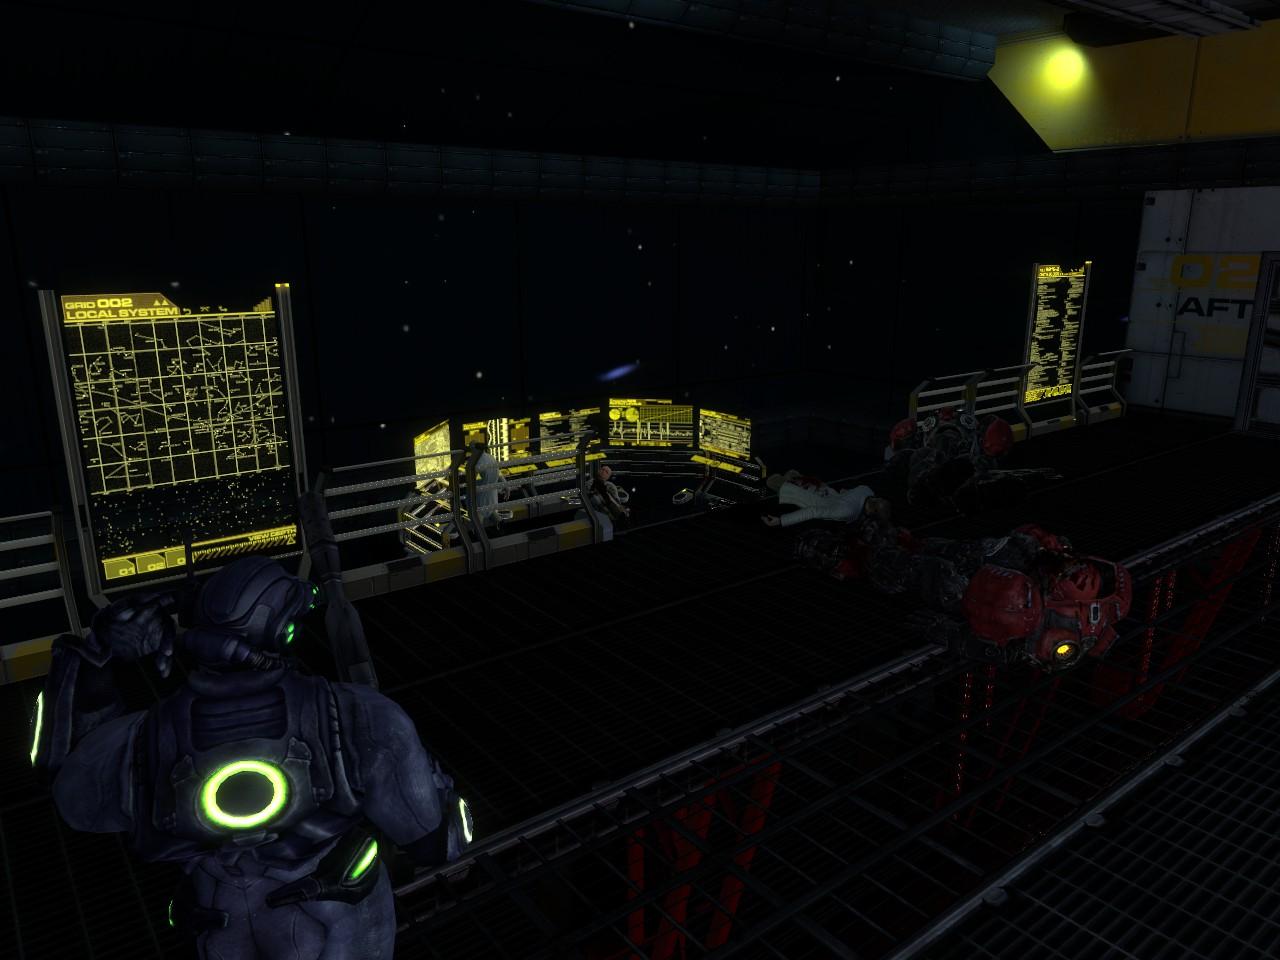 lt_scifibox_a0003.jpg - Half-Life 2 Gmod